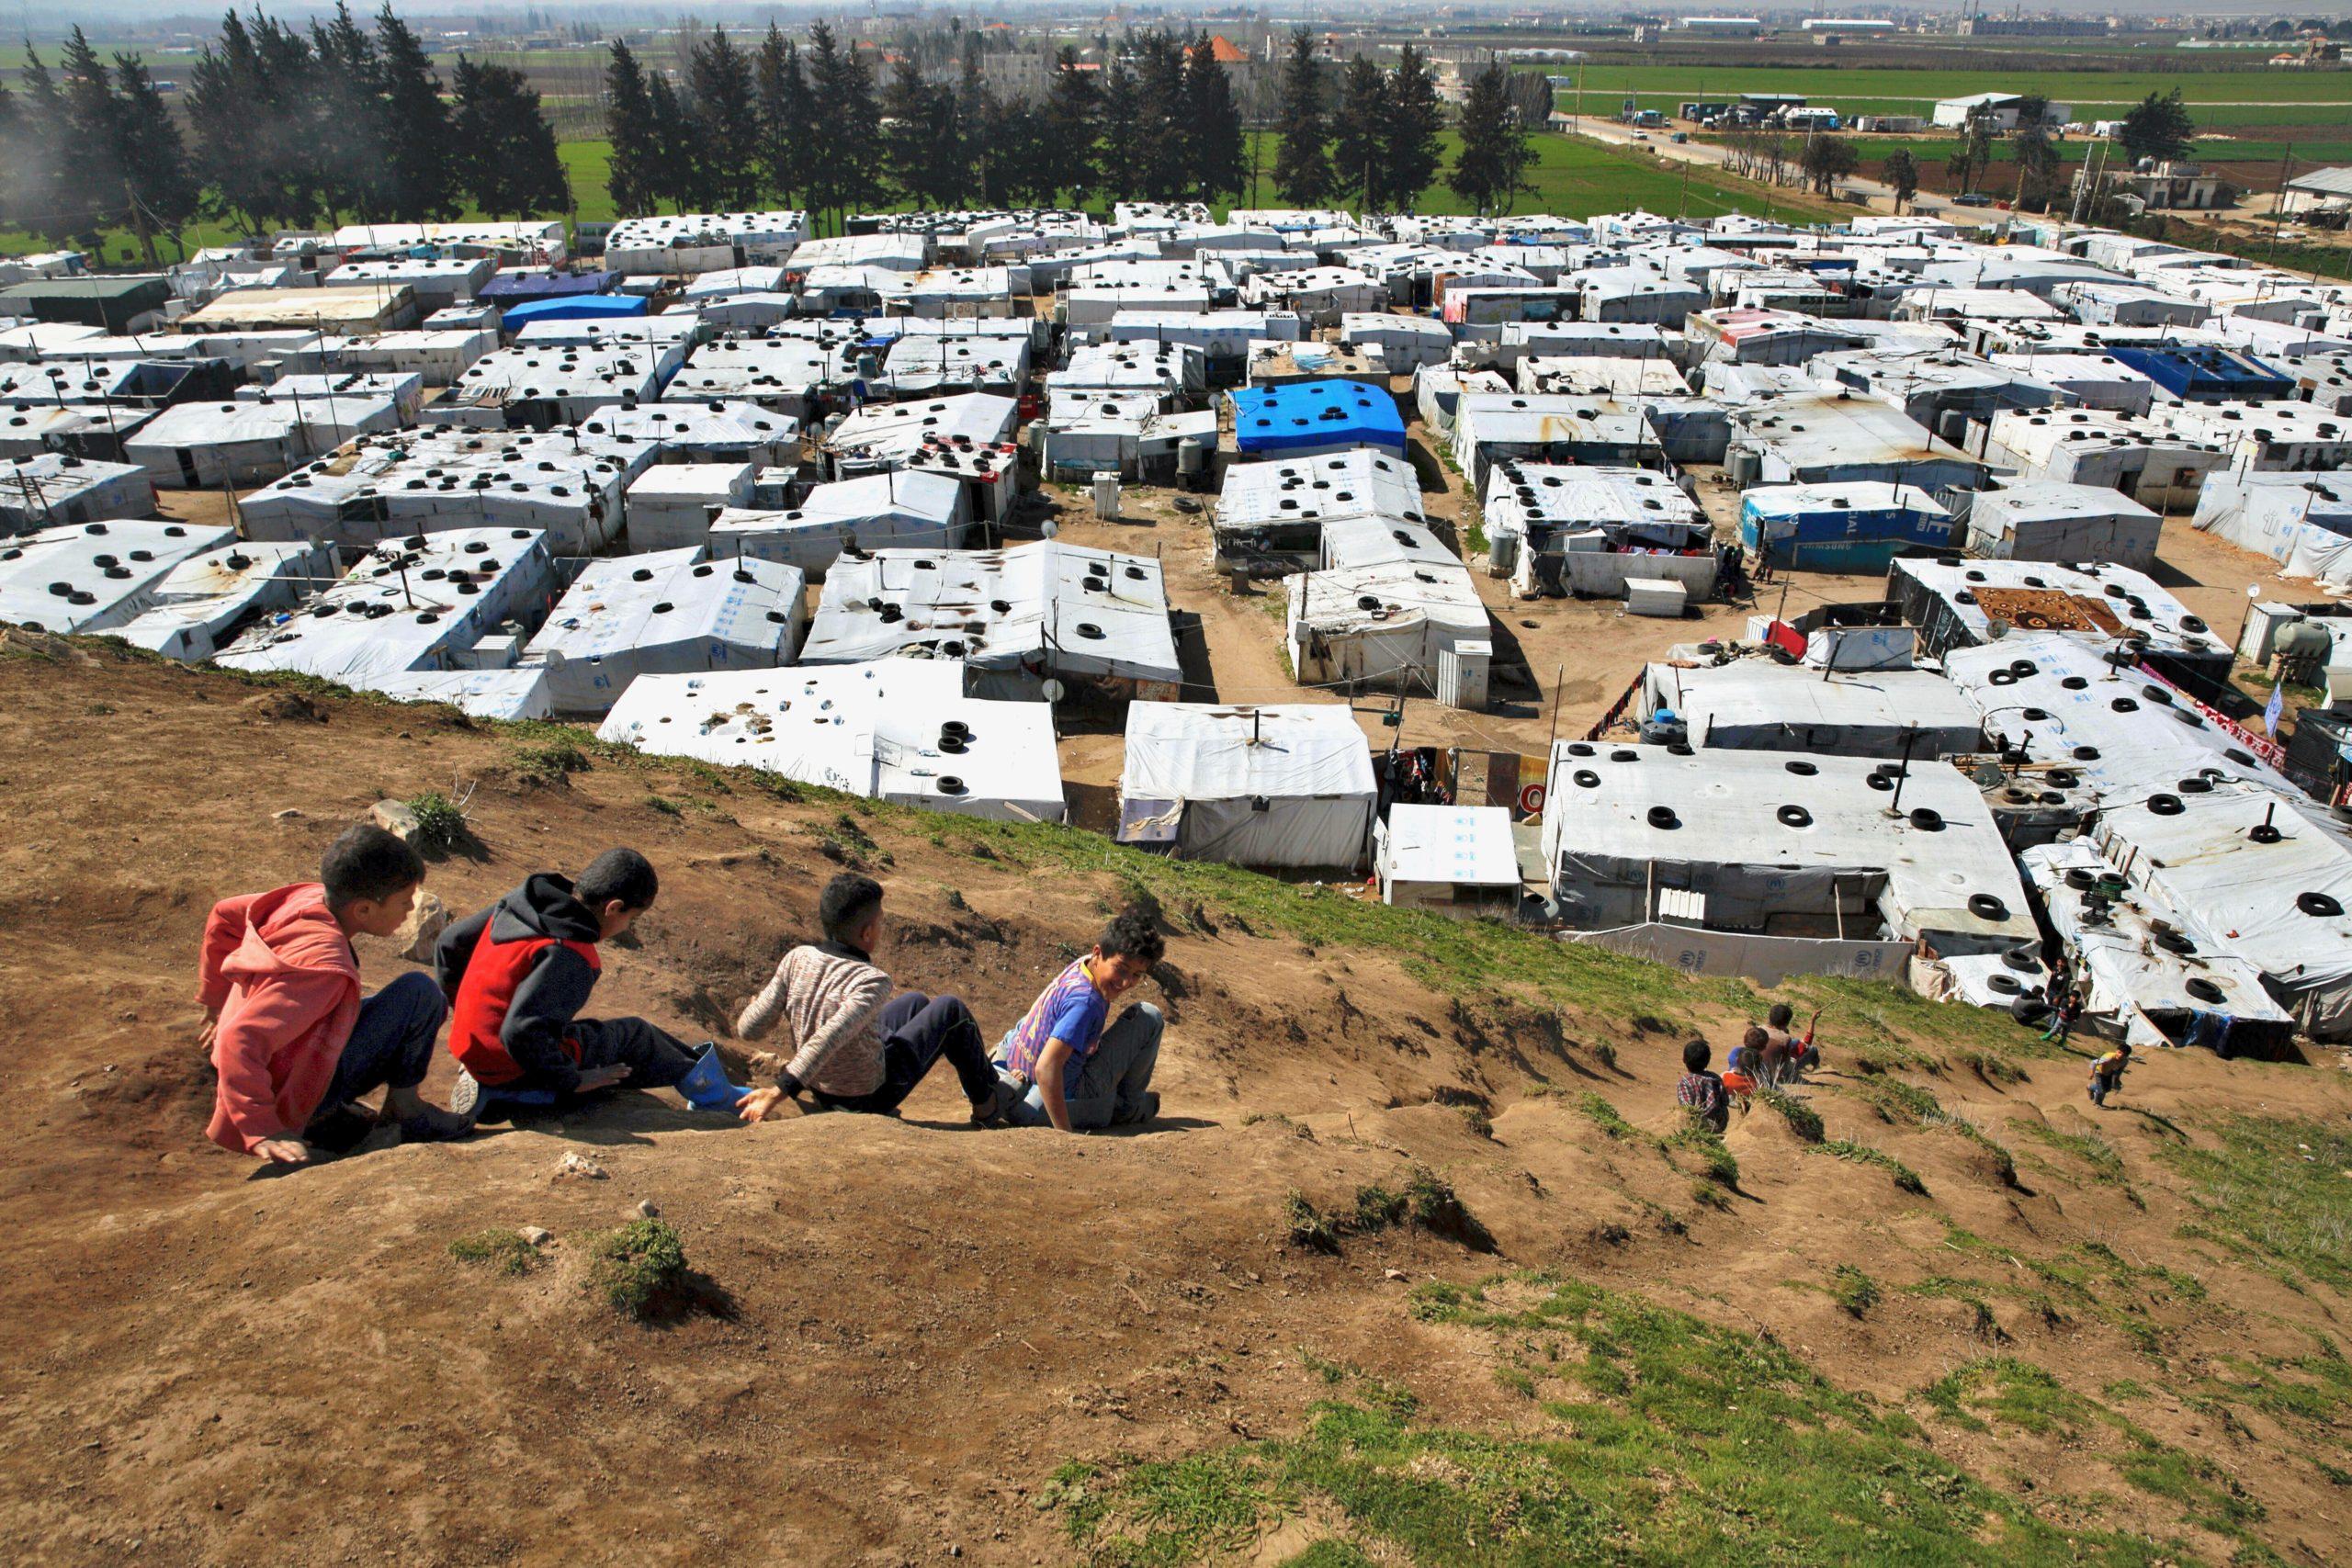 Bilal Hussein/AP